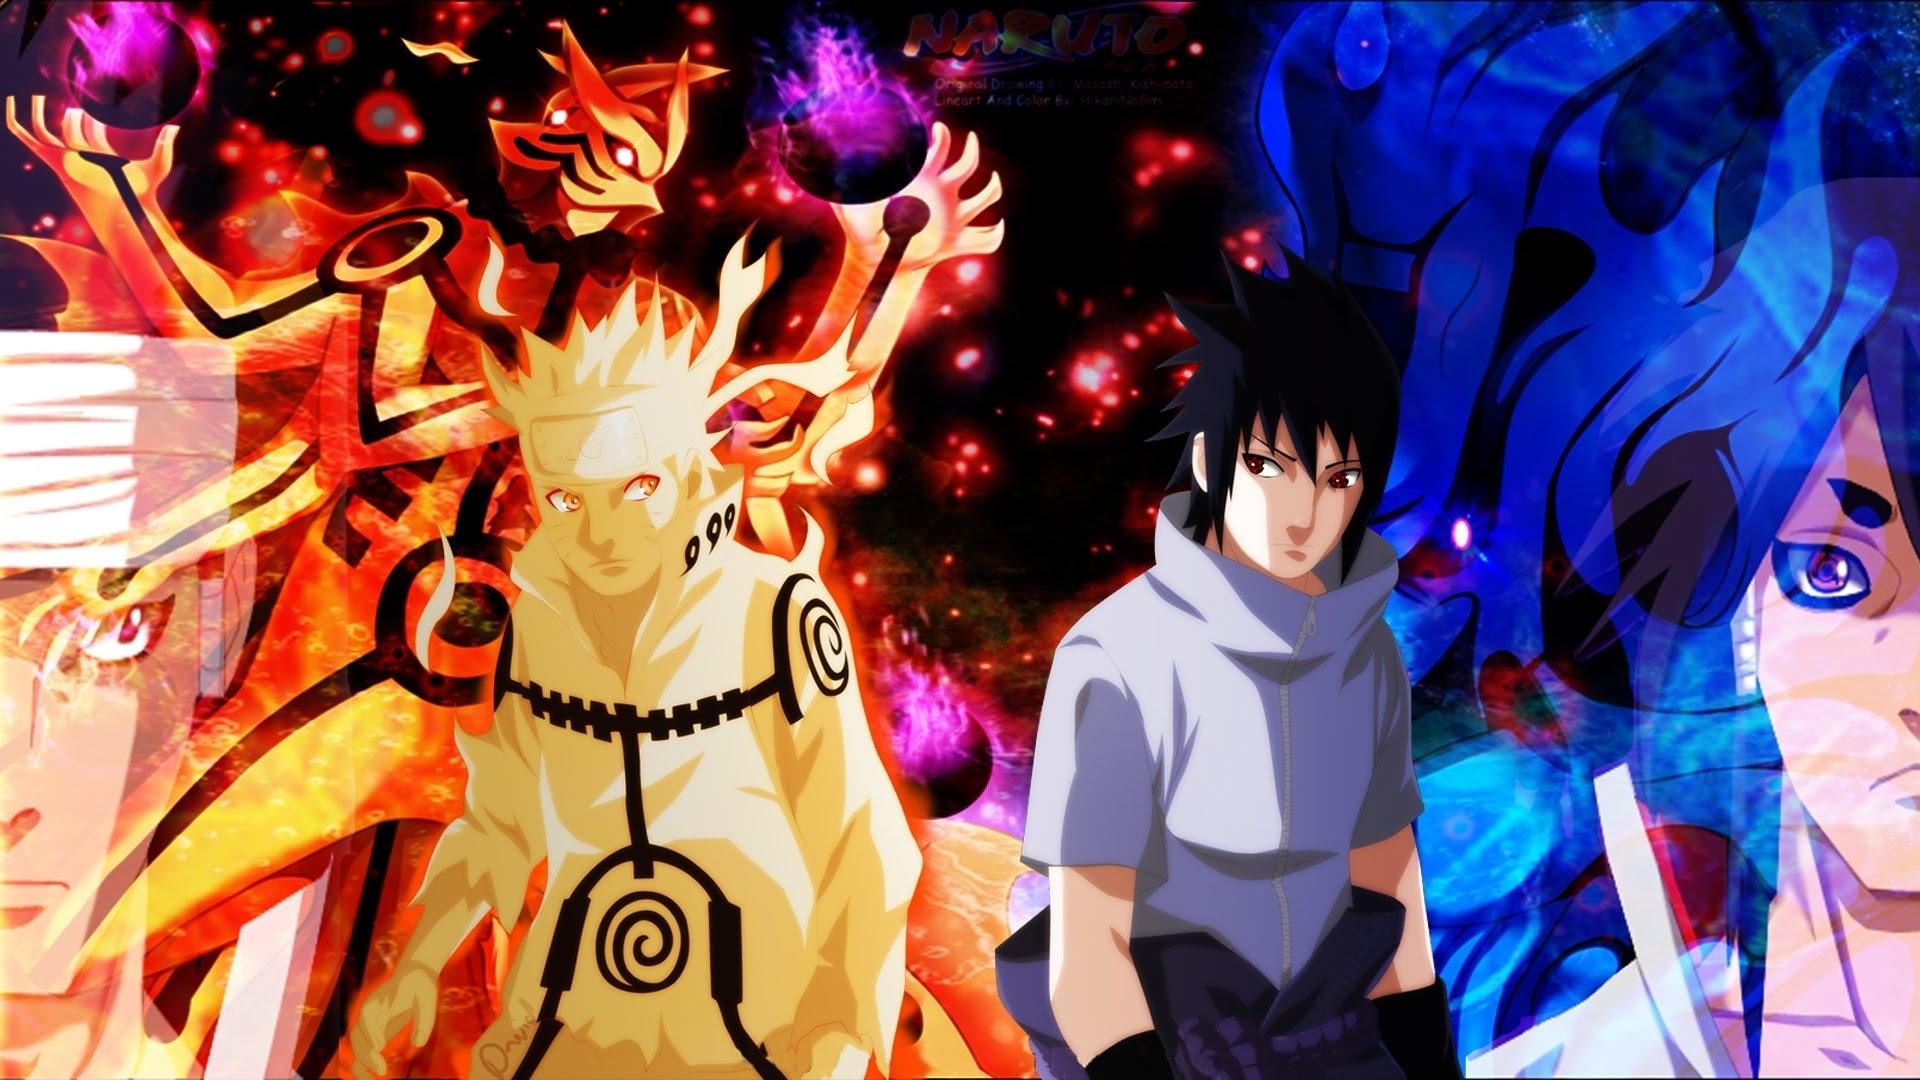 Battle Naruto Vs Sasuke Wallpaper Desktop Free Laptop Naruto Sasuke Wallpaper Hd 82837 Hd Wallpaper Backgrounds Download